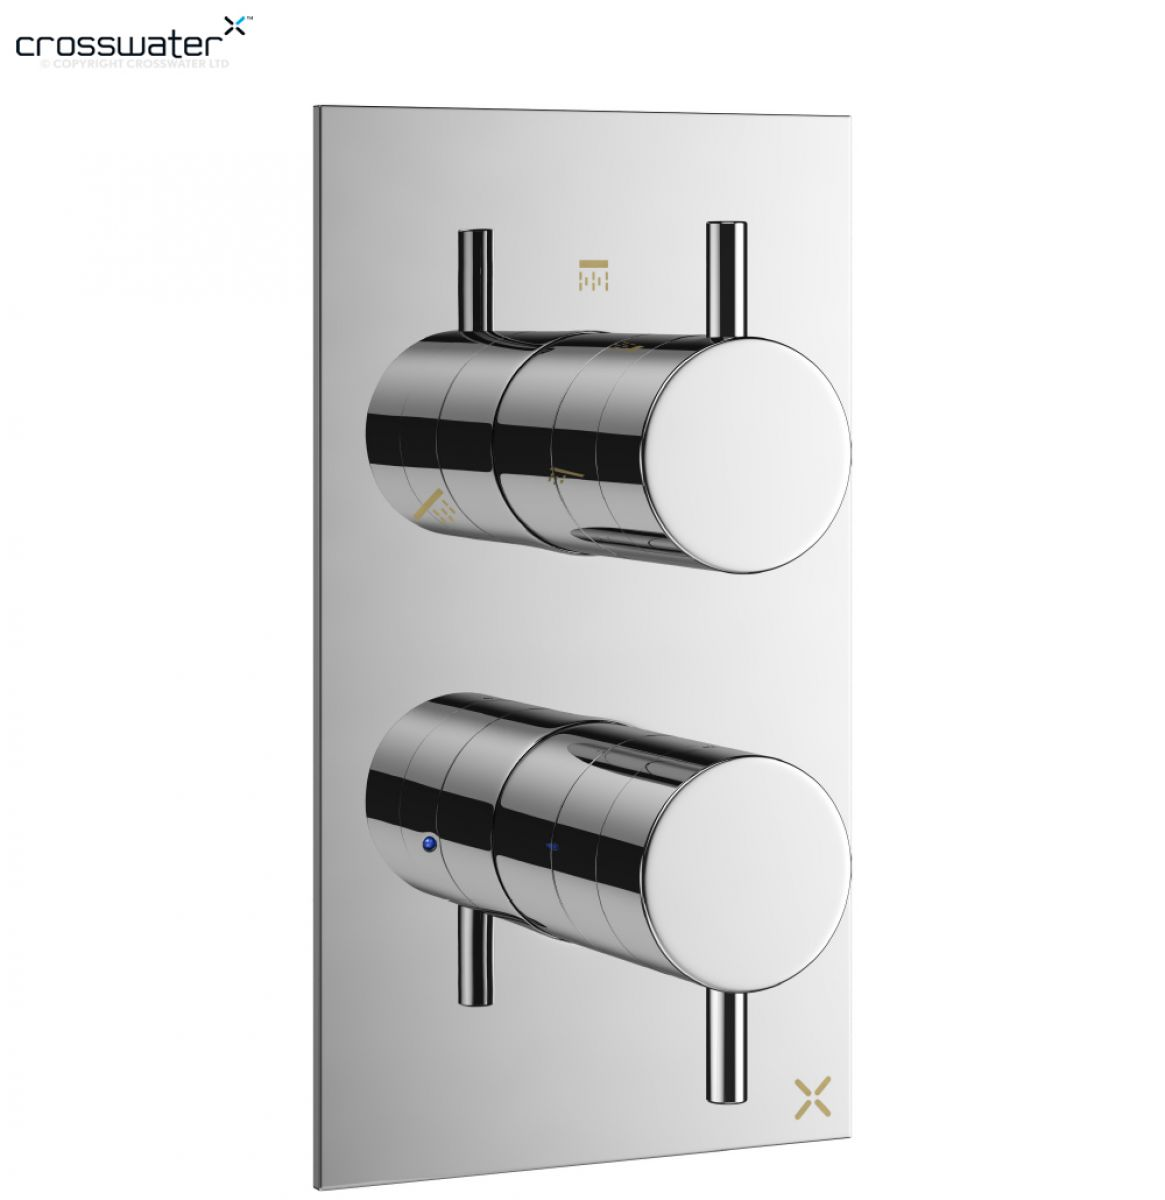 Crosswater MPRO Thermostatic Shower Valve 2 Controls